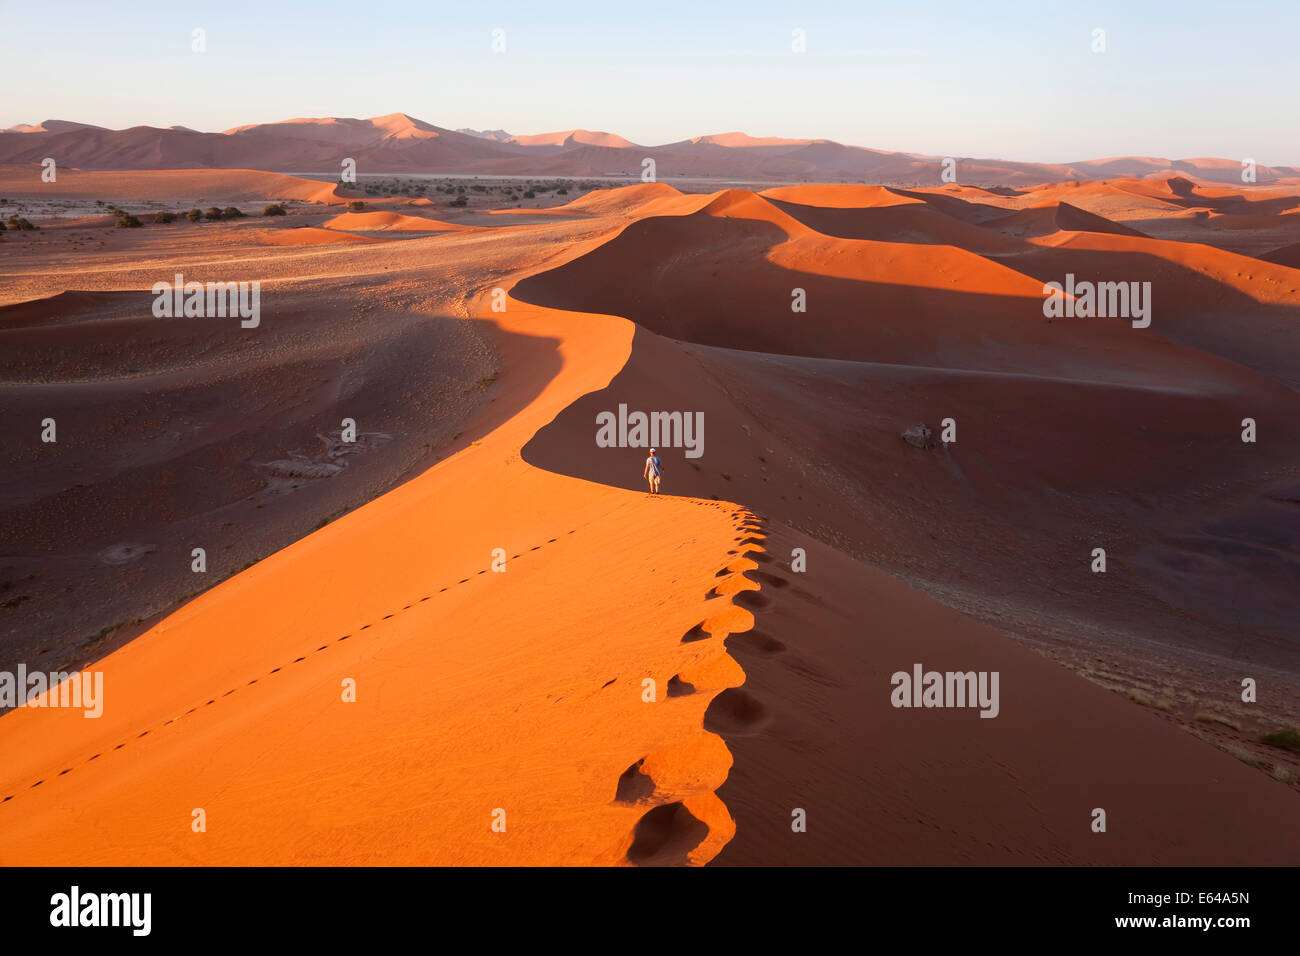 Uomo di mezza età arrampicata dune di sabbia, Namib Naukluft National Park, Namibia Immagini Stock